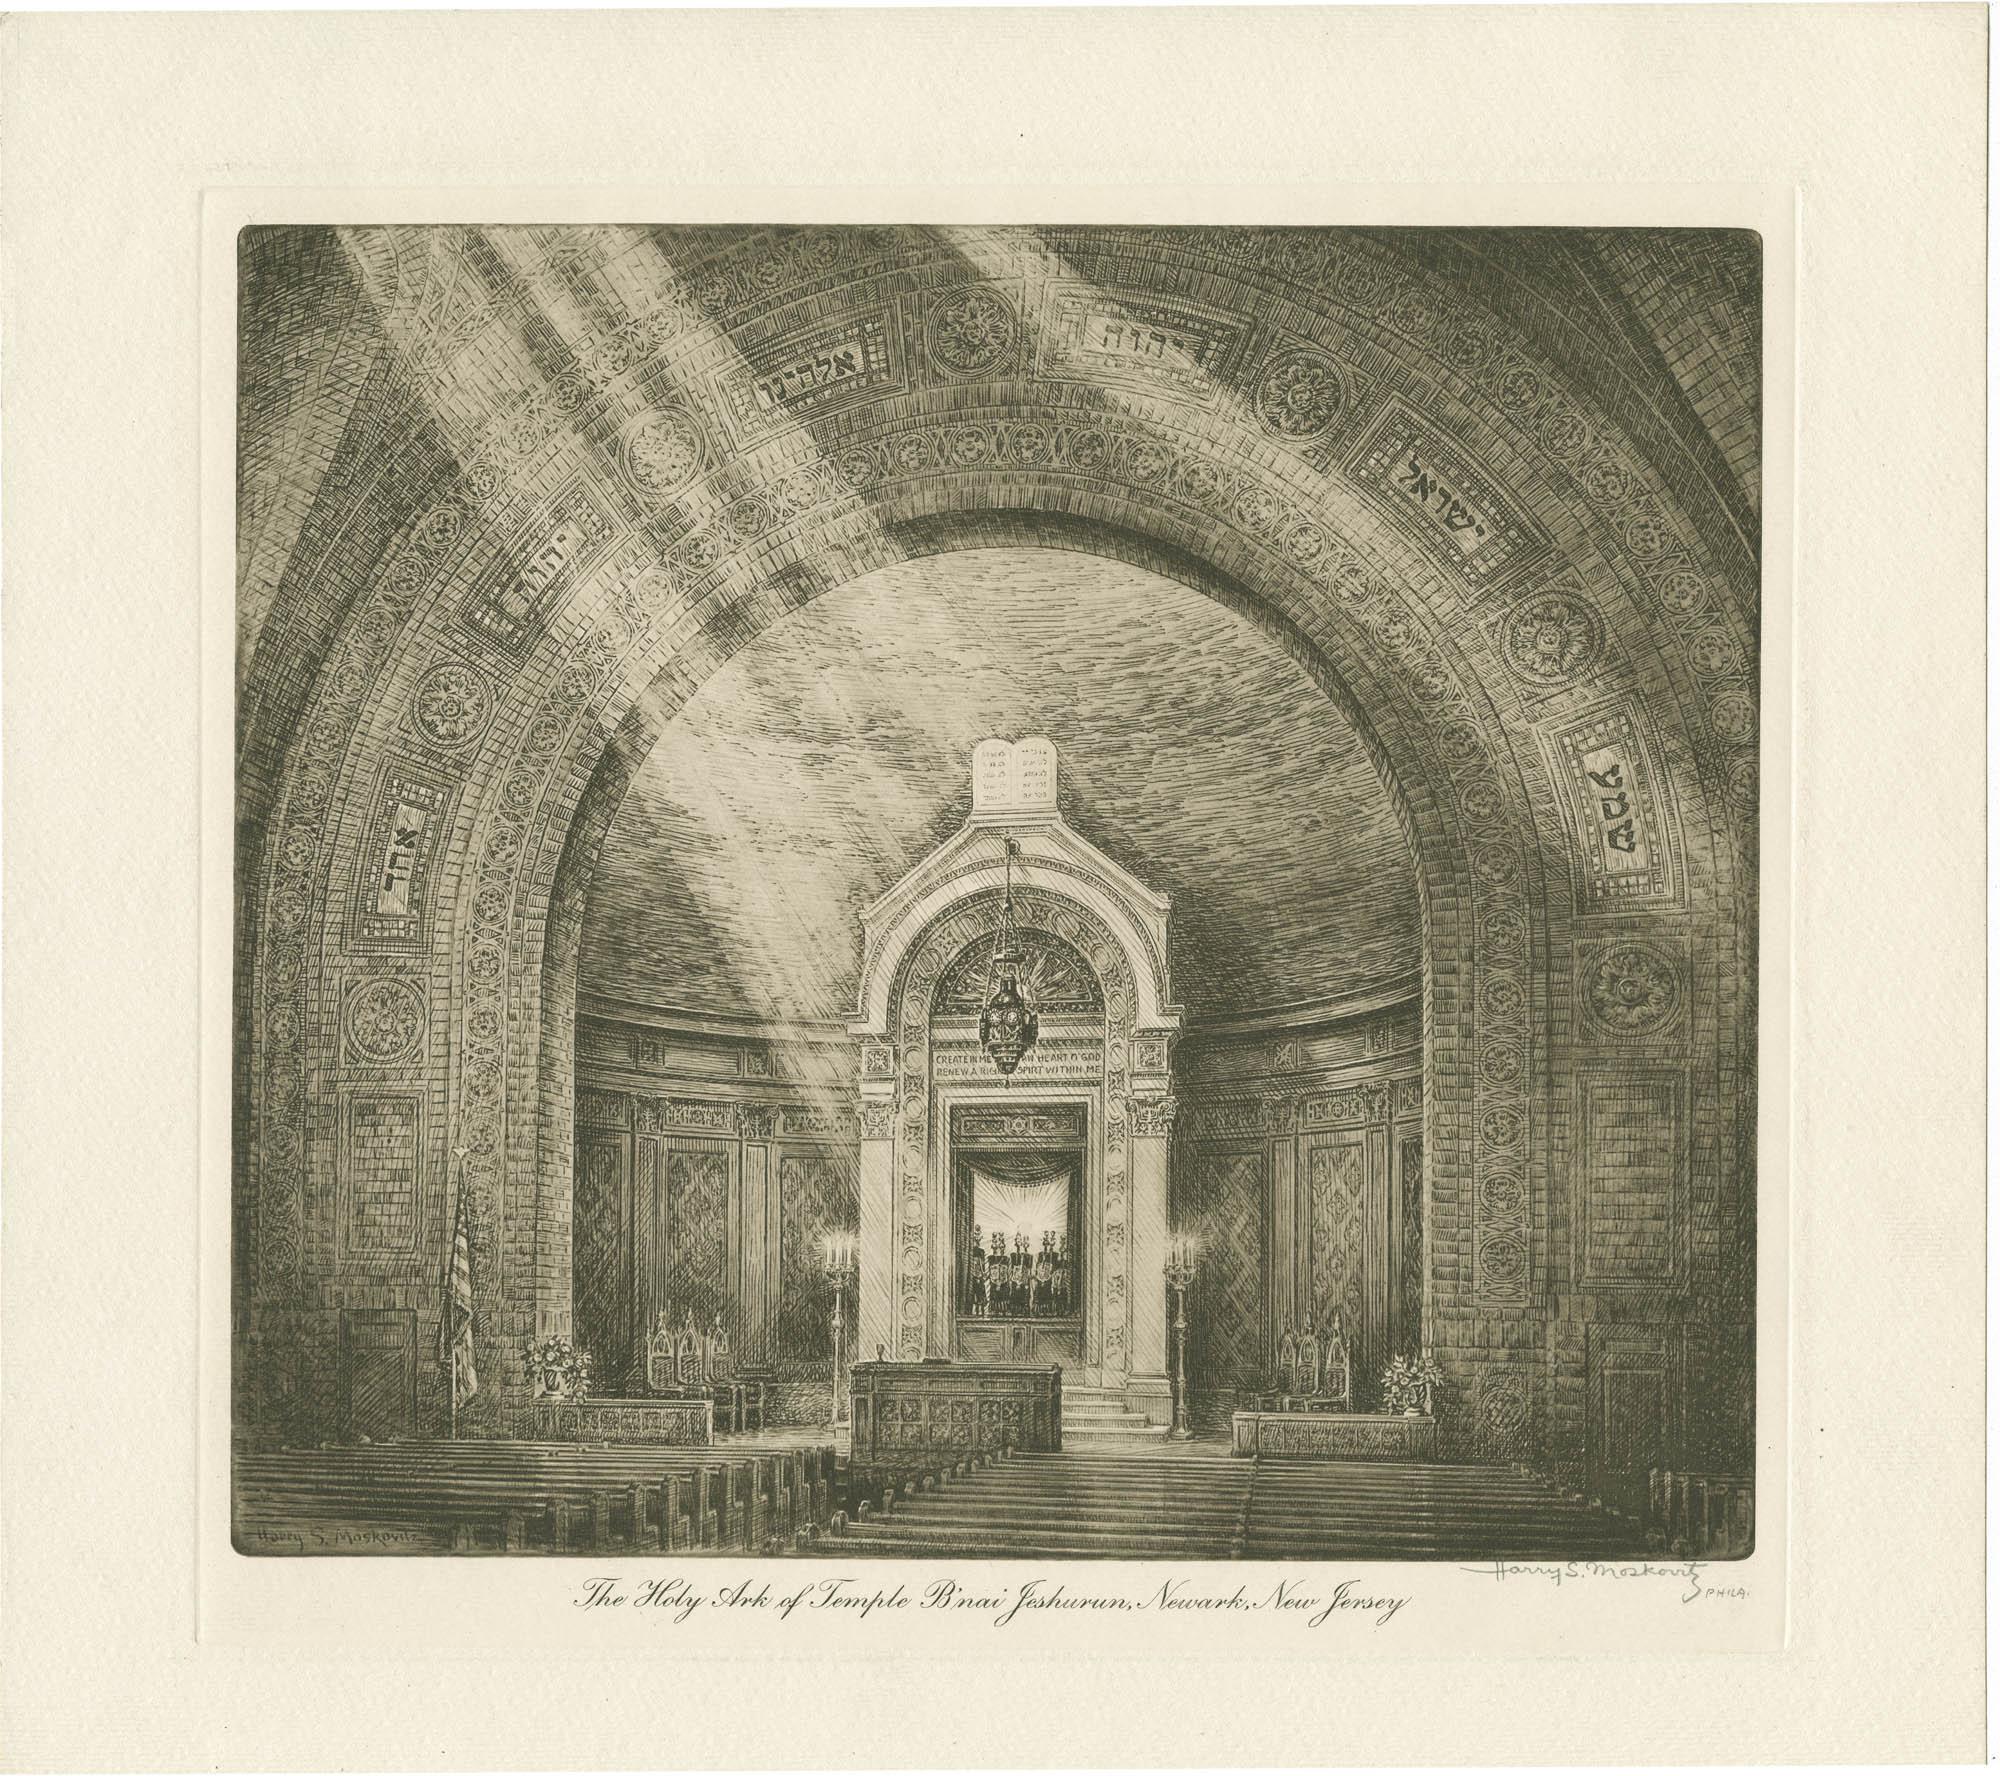 The Holy Ark of Temple B'nai Jeshurun, Newark, New Jersey